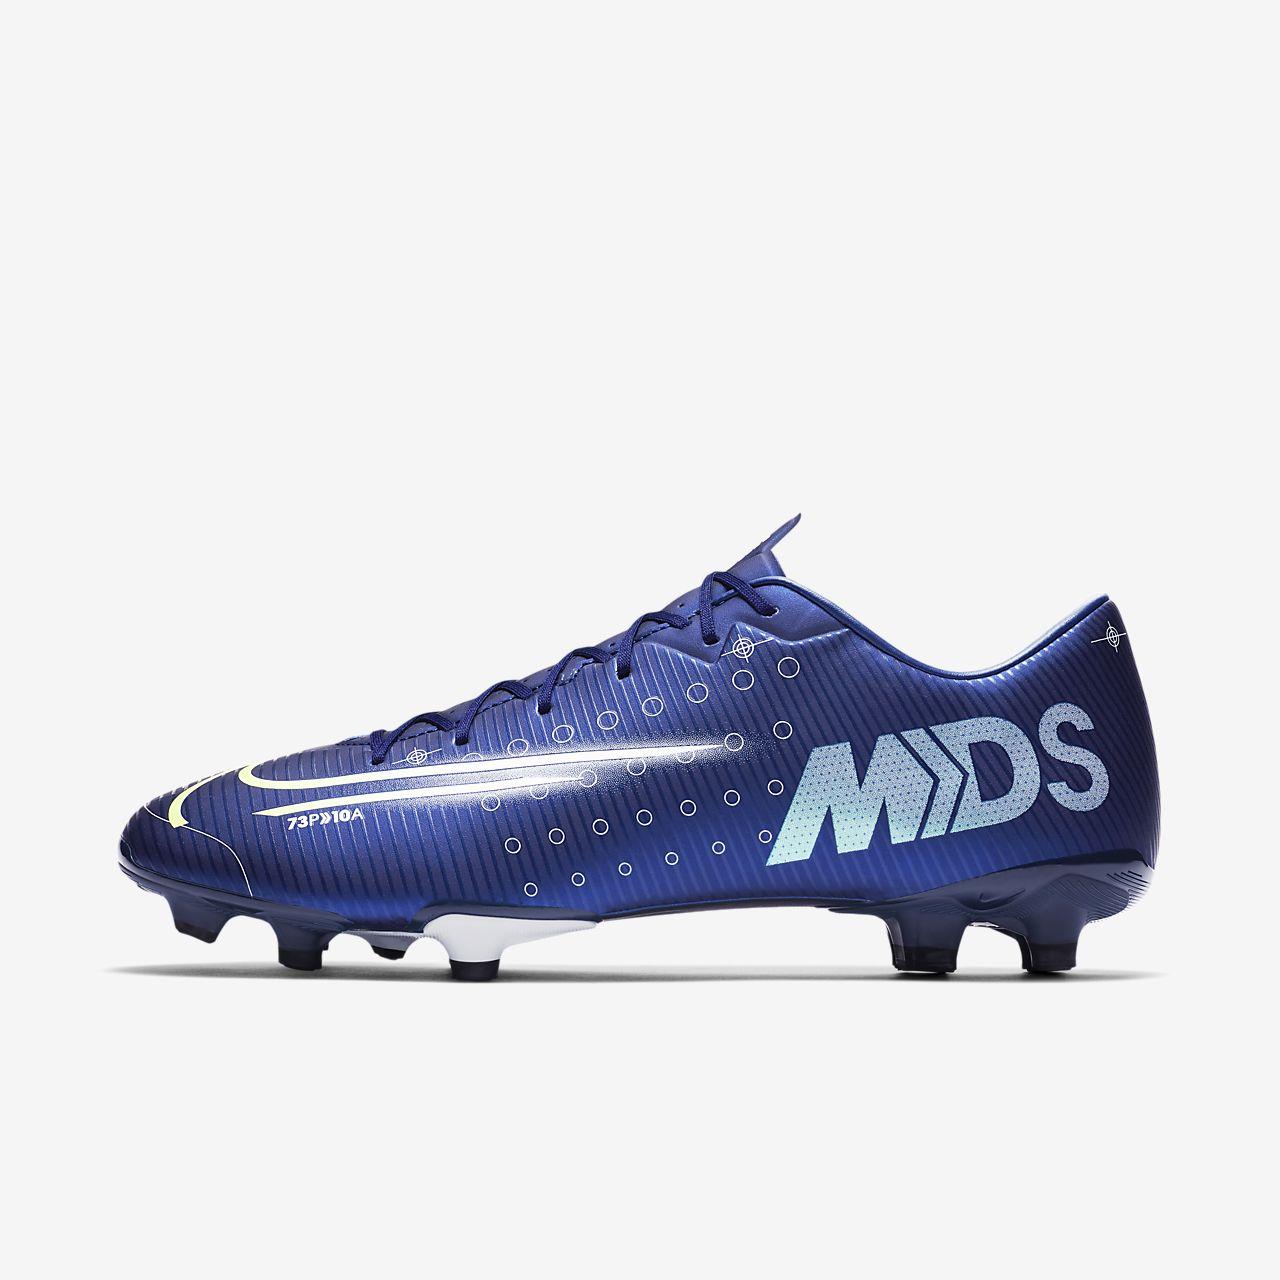 Chaussure de football multi surfaces à crampons Nike Mercurial Vapor 13 Academy MDS MG